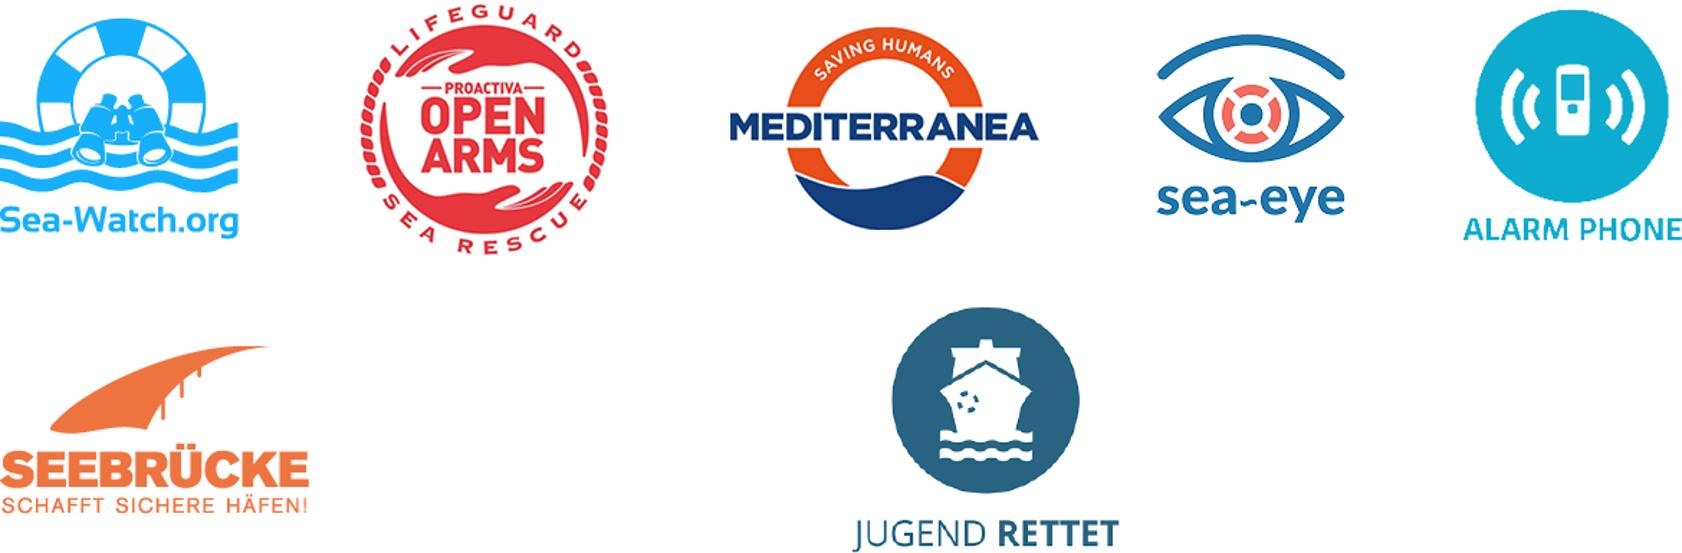 Signatory SAR Civil Fleet Organizations